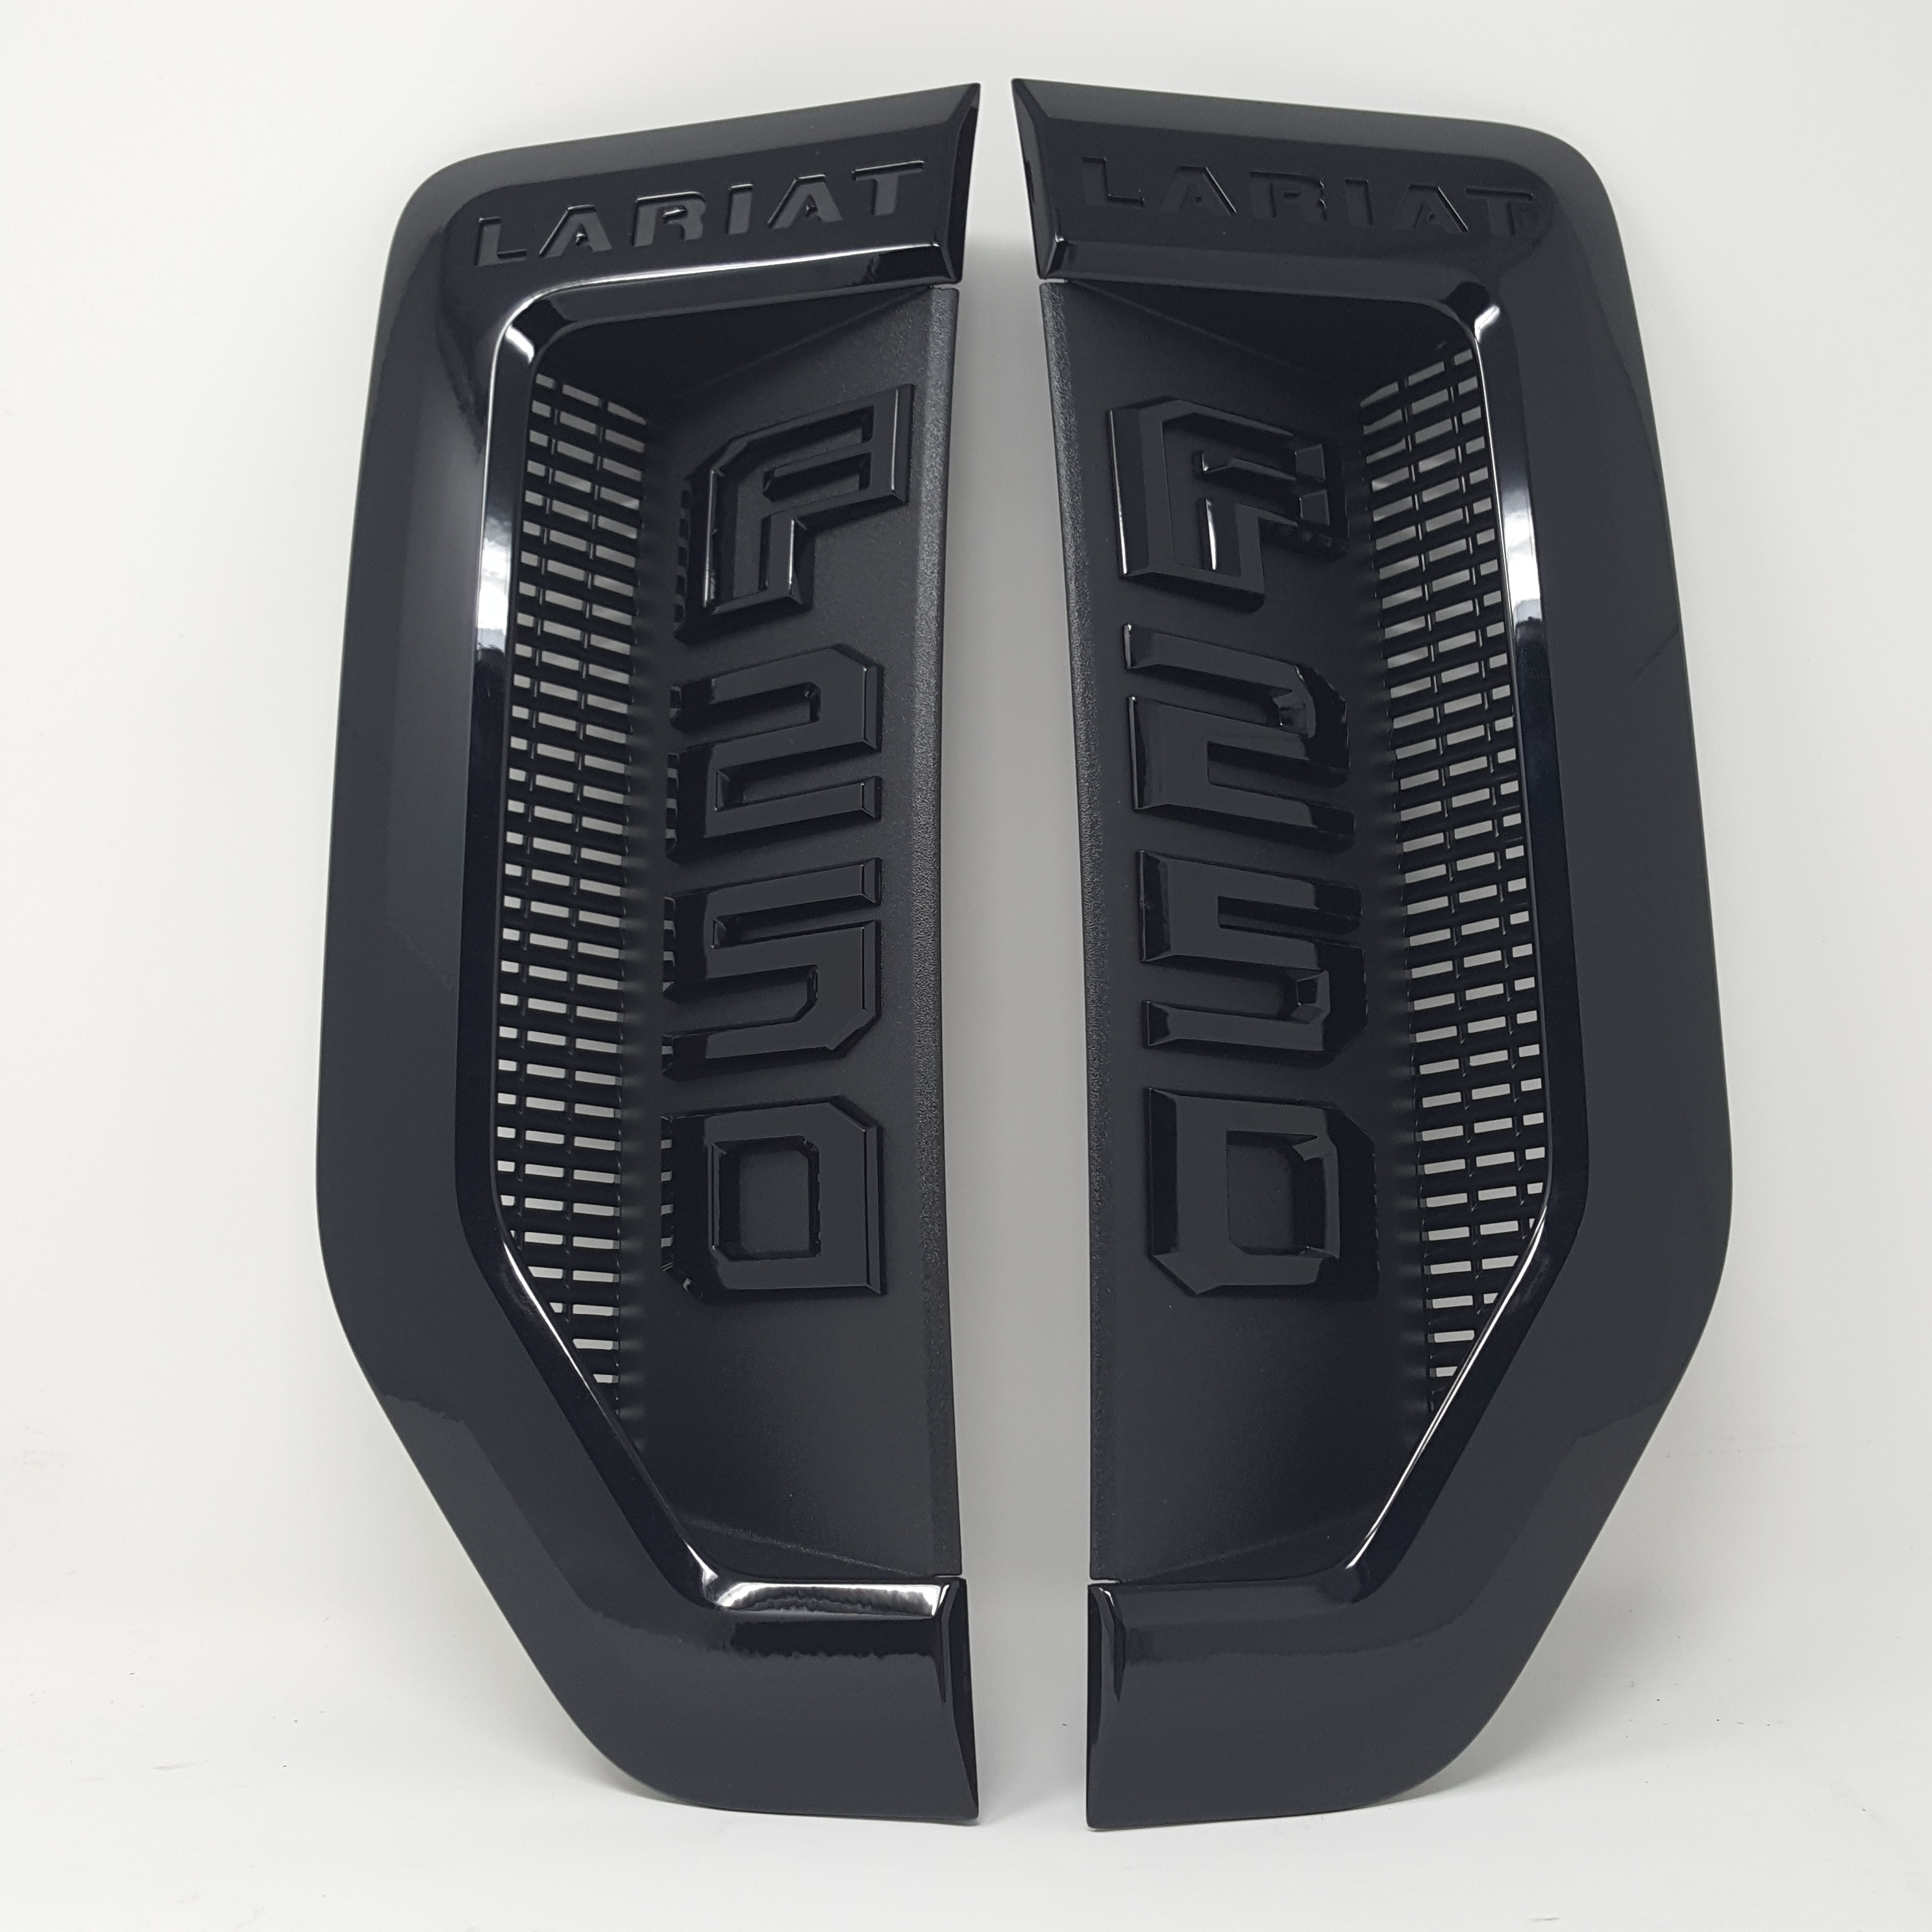 3x OEM Black F-250 XLT Super Duty Side Fender Emblems for Ford F250 XLT W Red